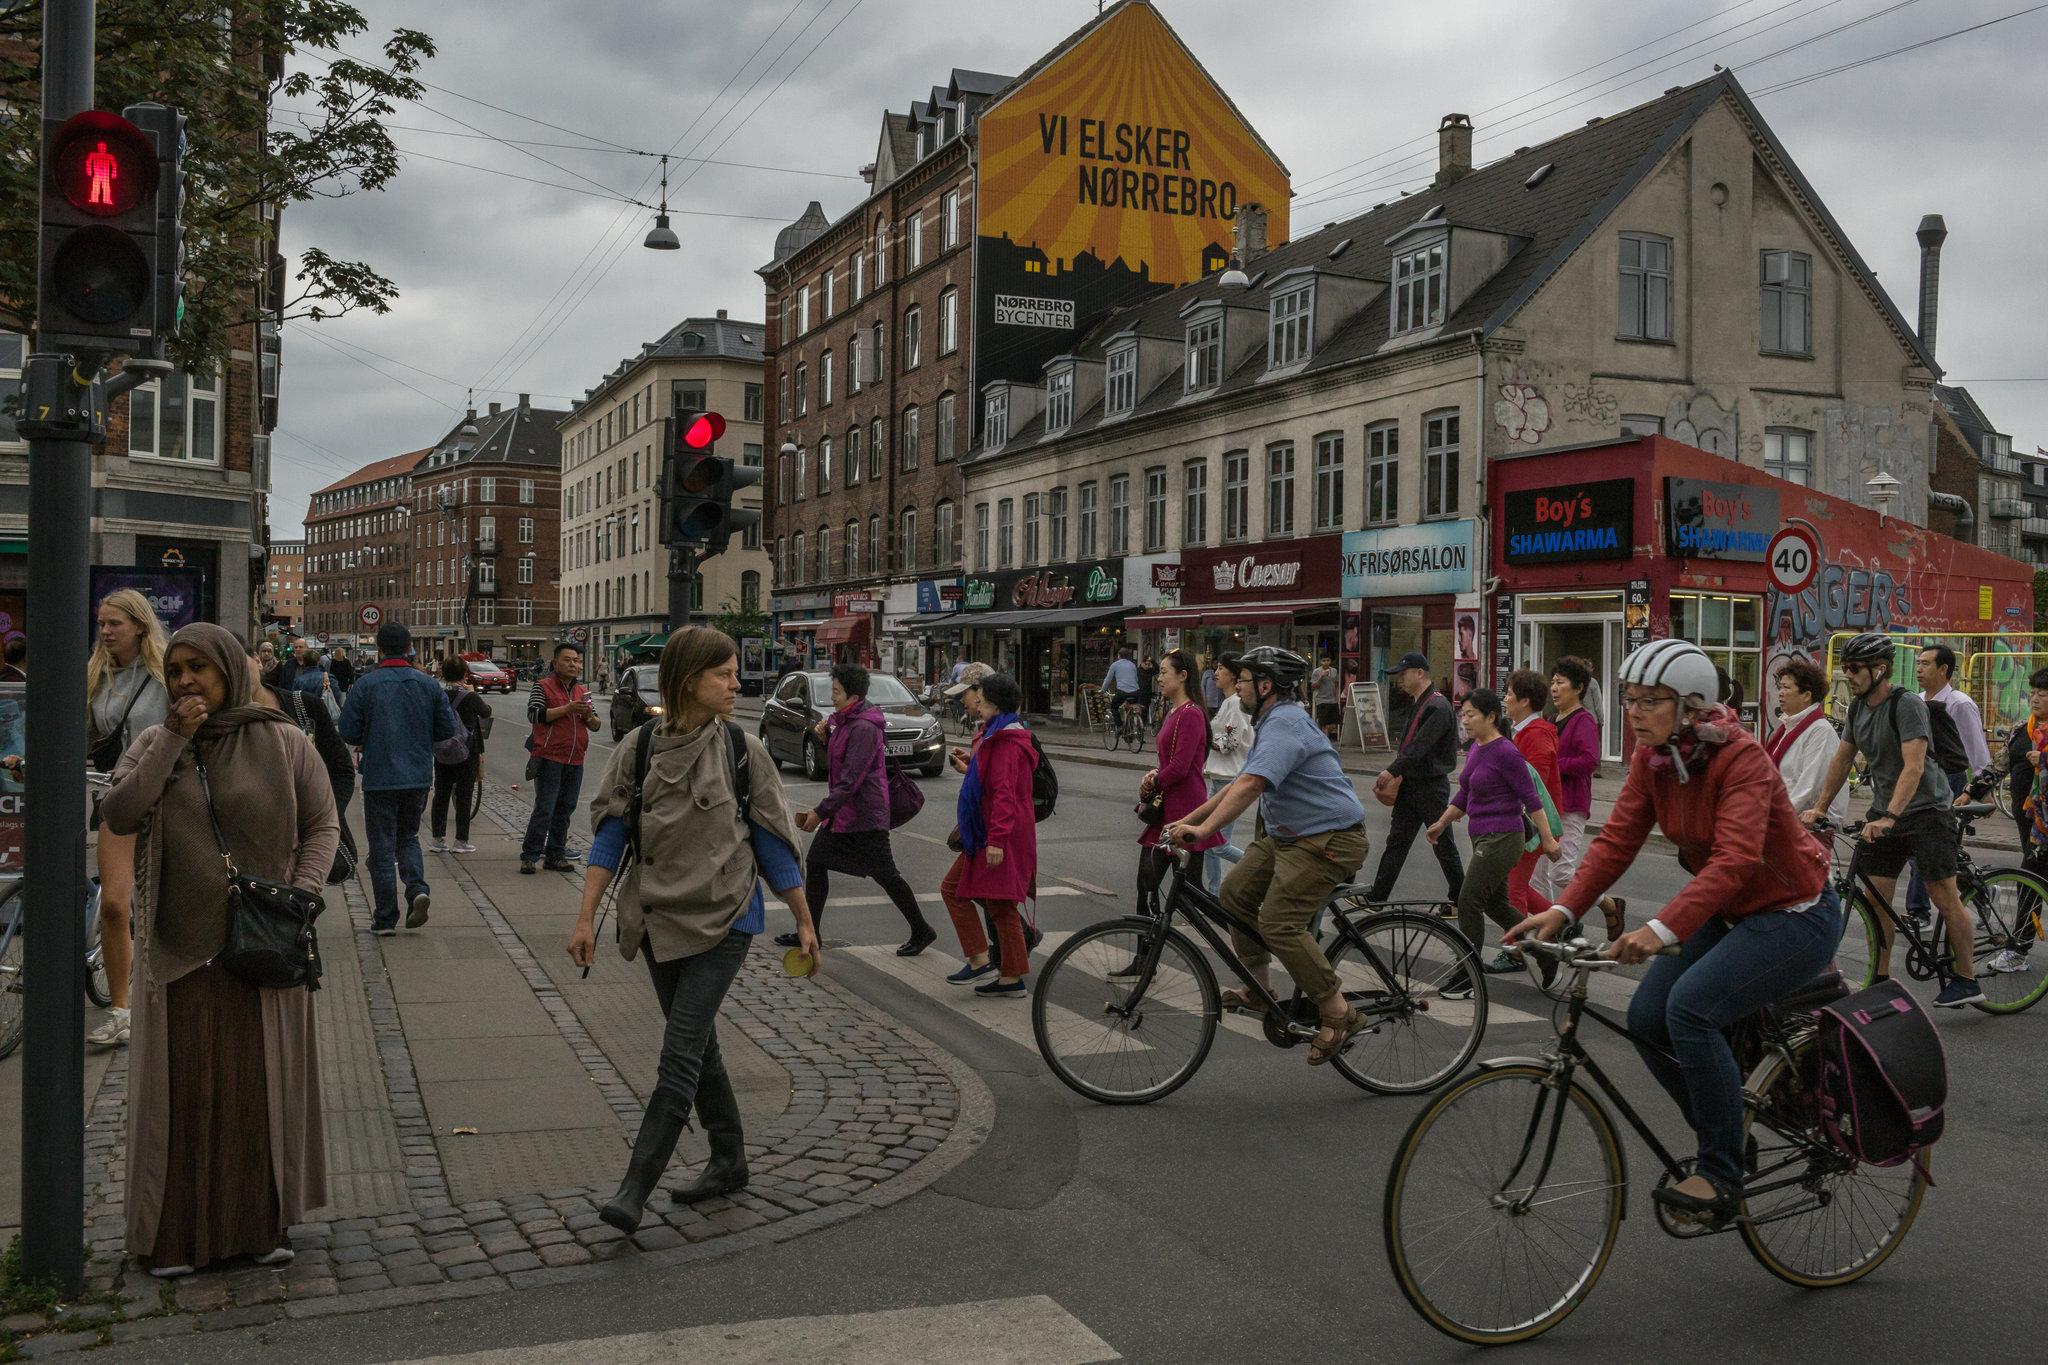 Građani Kopenhagena prelaze raskrsnicu (Foto: Mauricio Lima/The New York Times)